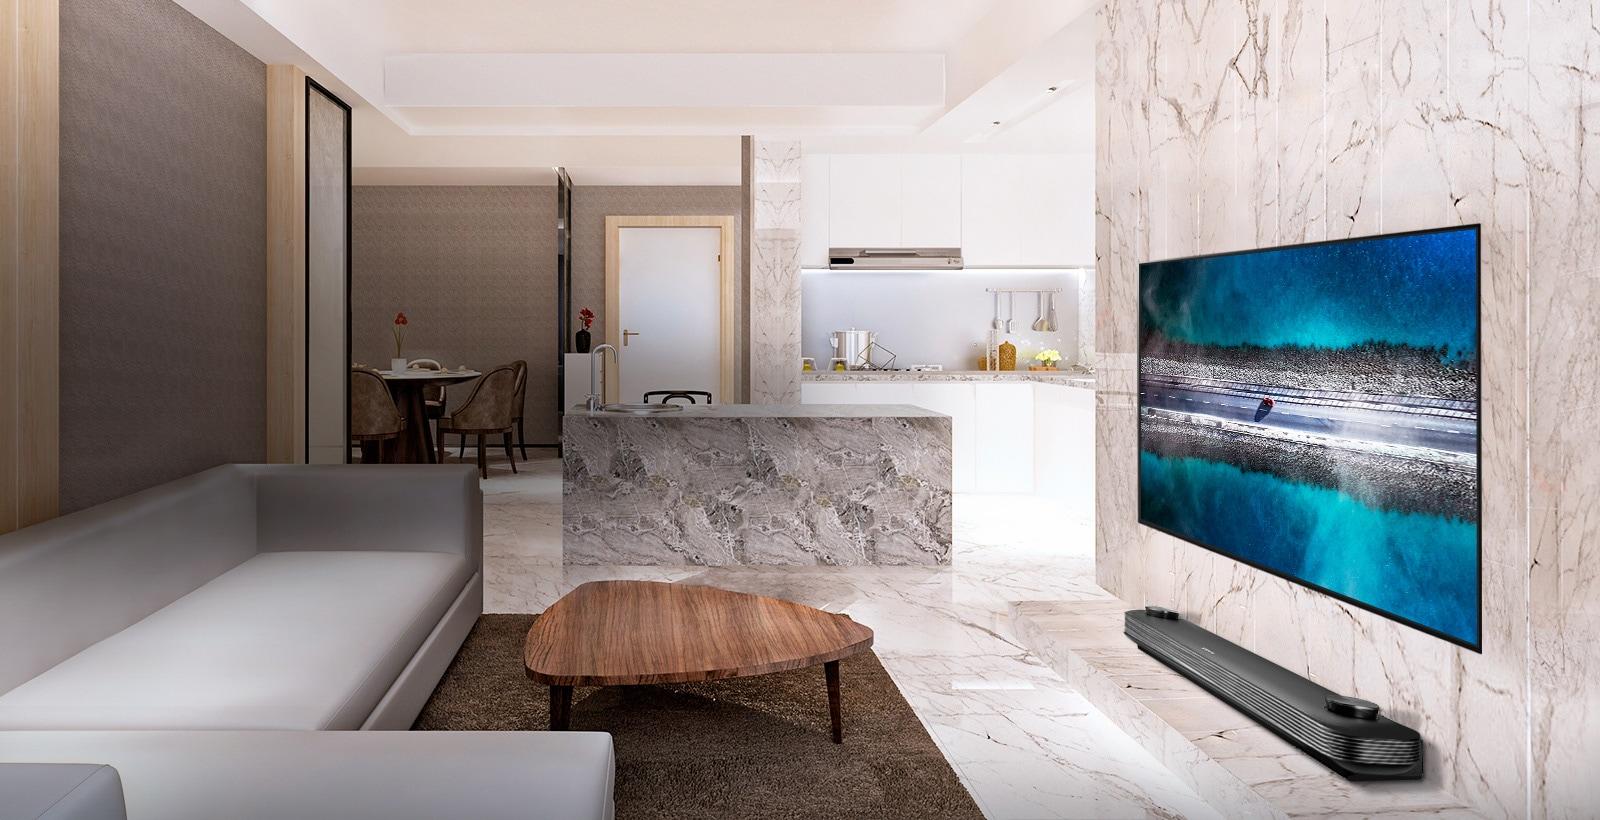 TV-SIGNATURE-OLED-W9-01-Intro-Desktop-V00.jpg (1600×820)